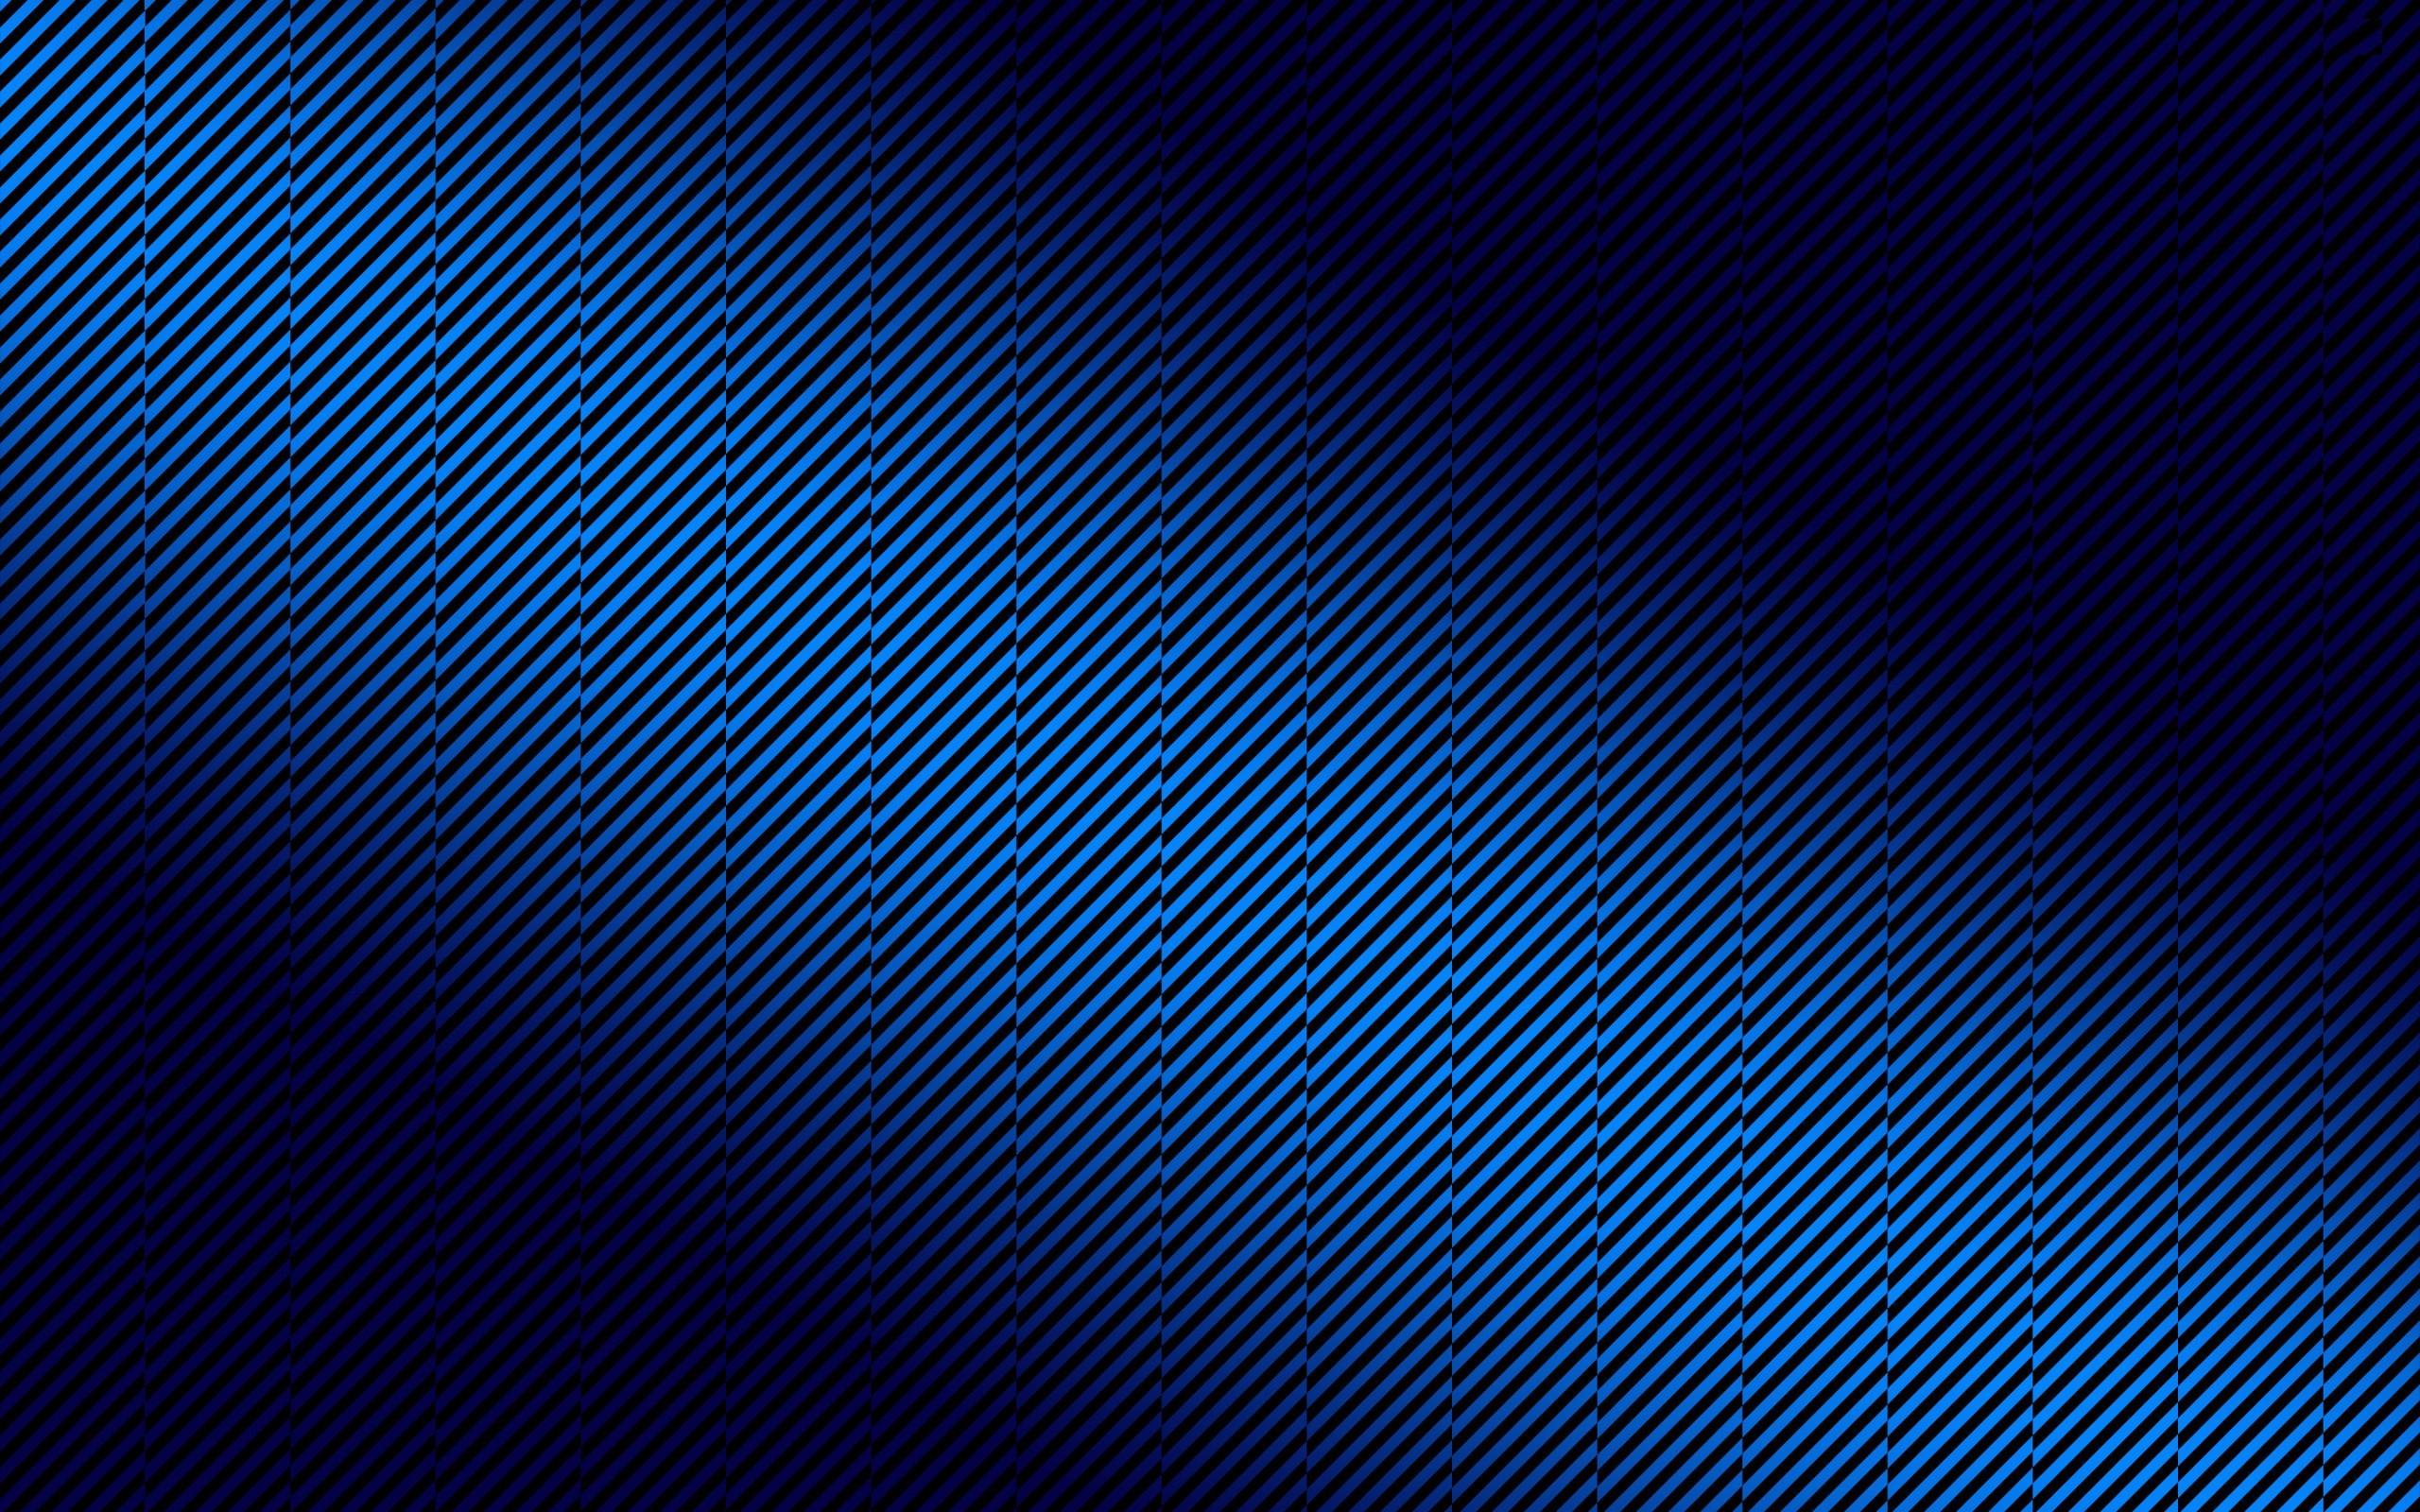 Diagonal stripes HD digital art wallpaper.